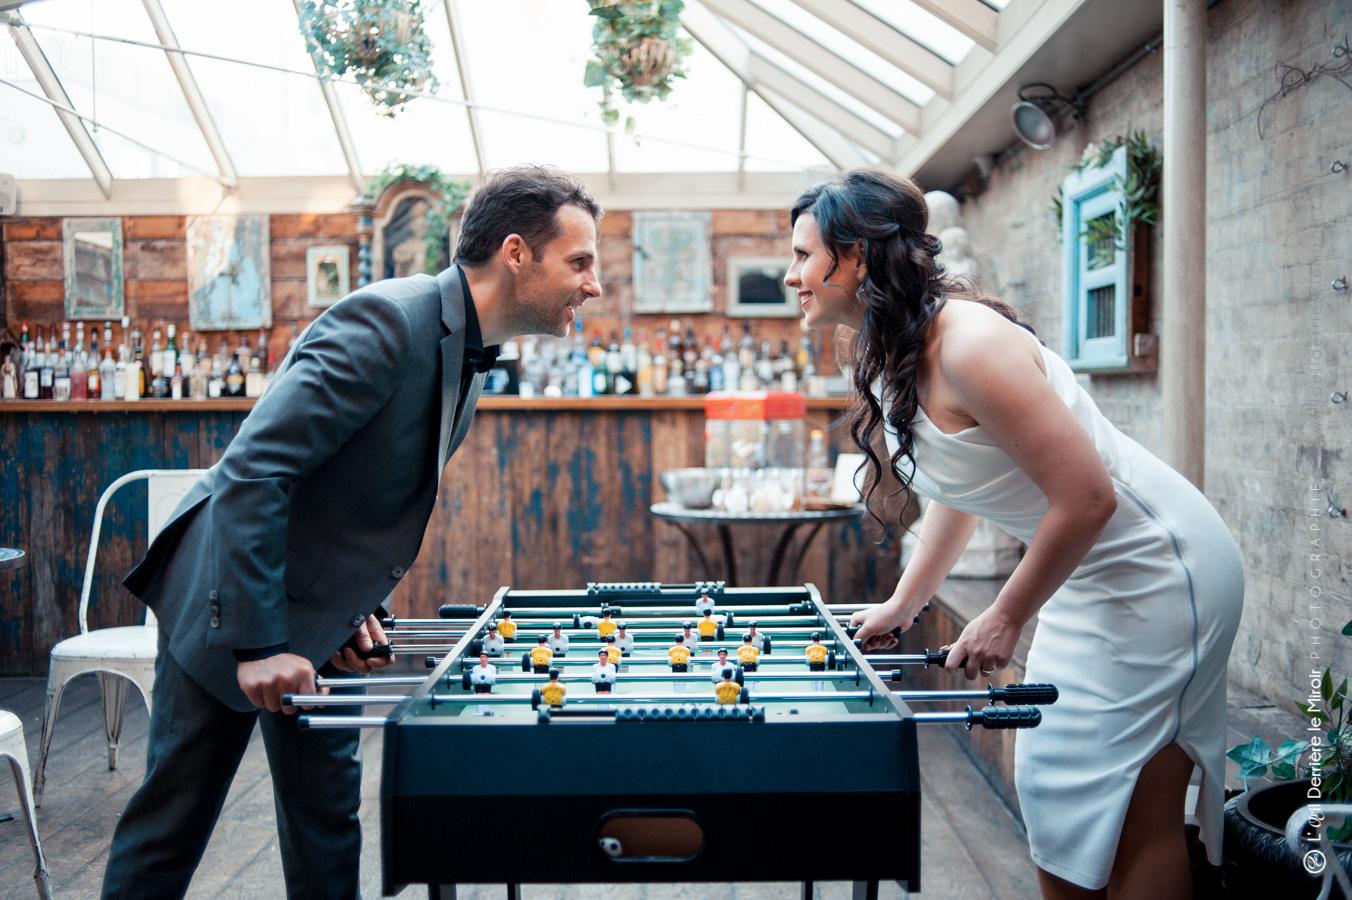 Destination-wedding-photographer-london-AG-082